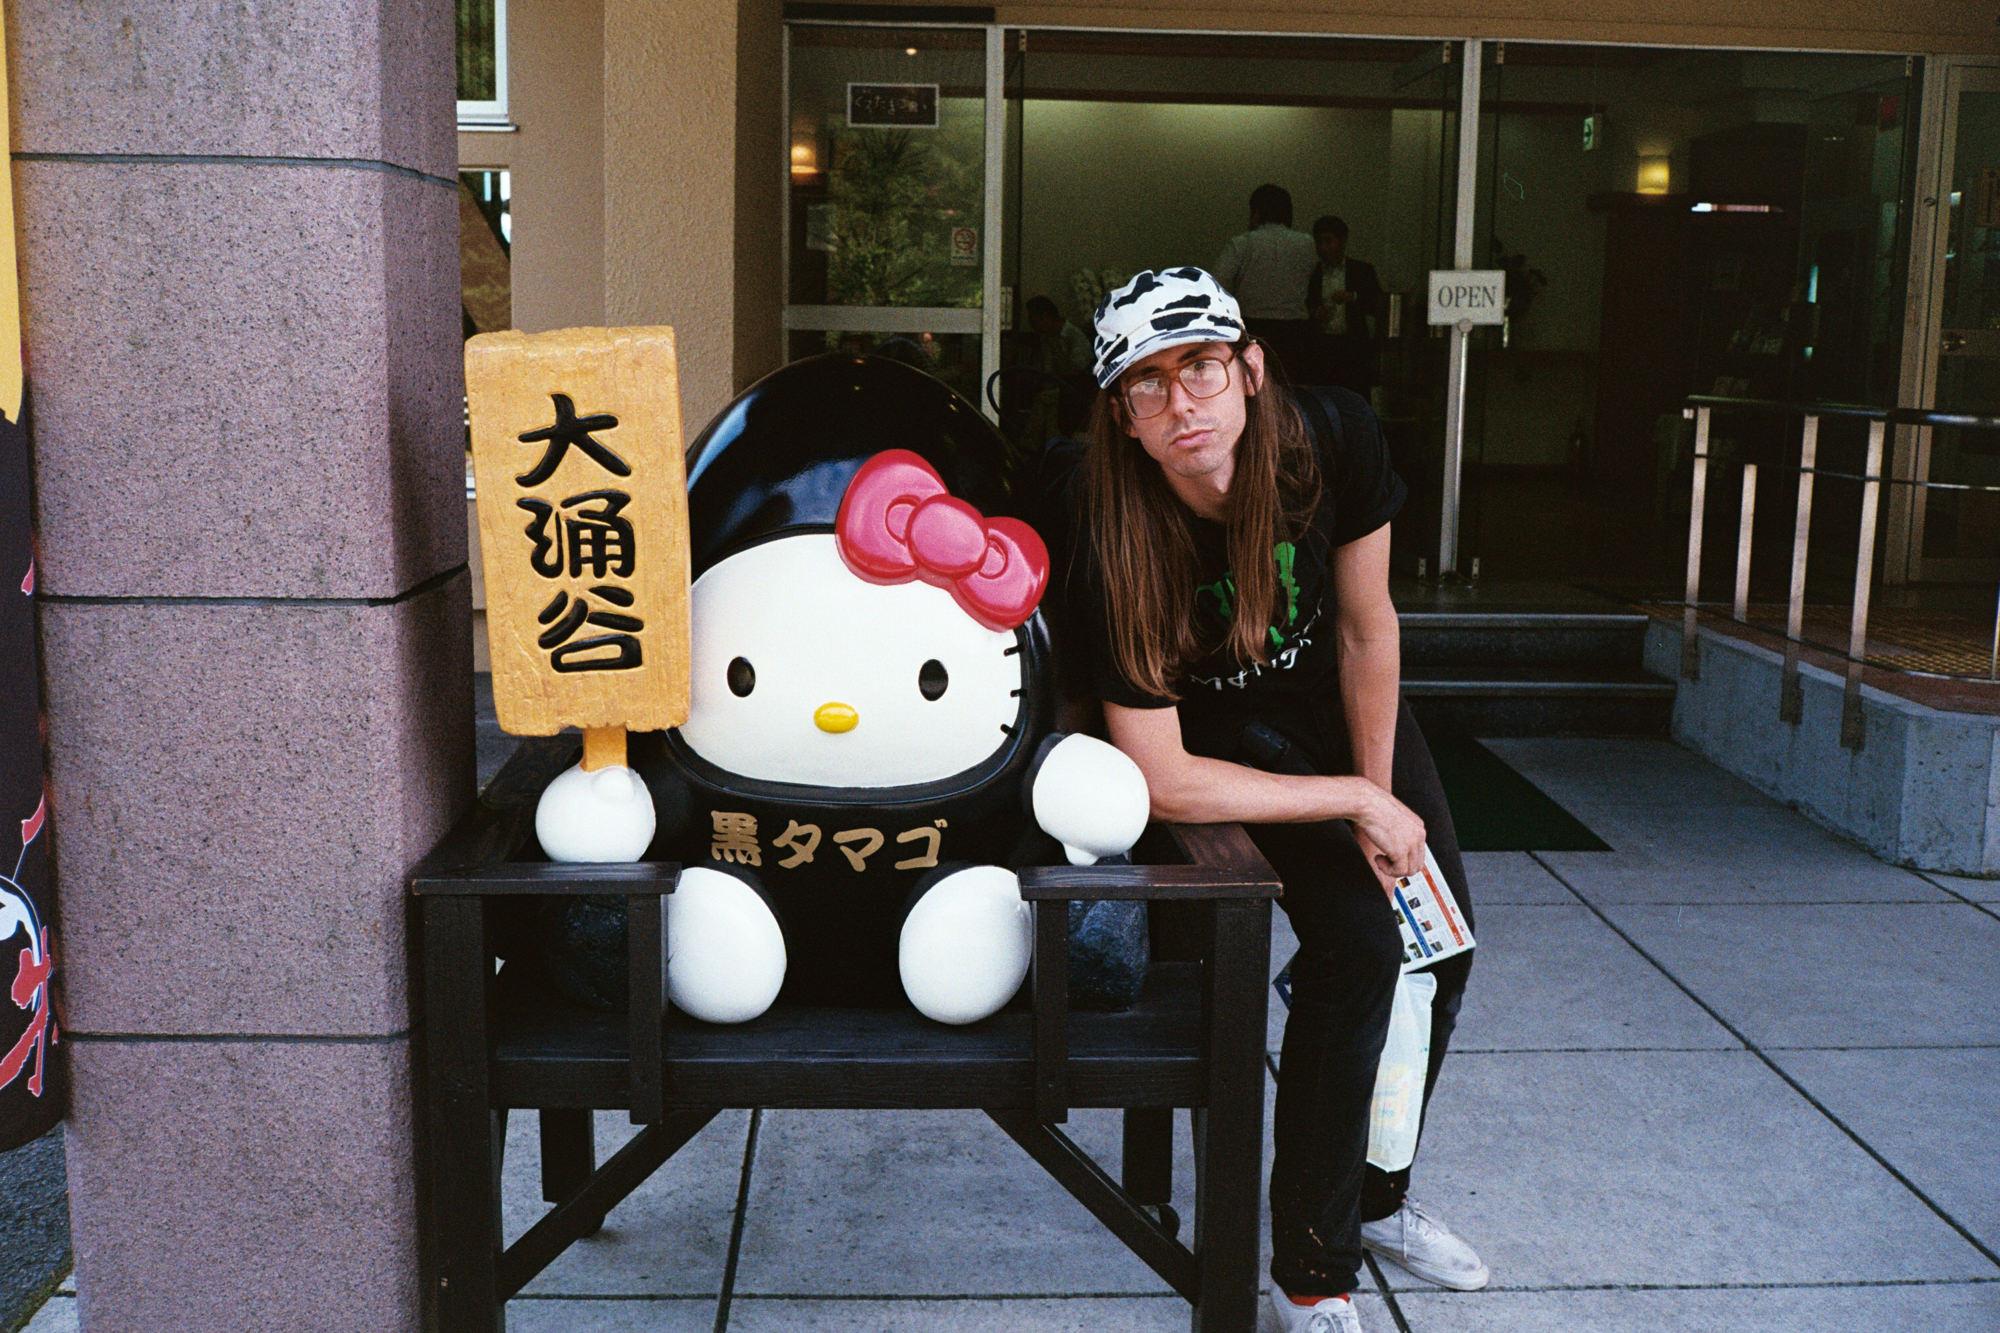 wrenee-hakone-japan-black-eggs-hello-kitty-4.jpg